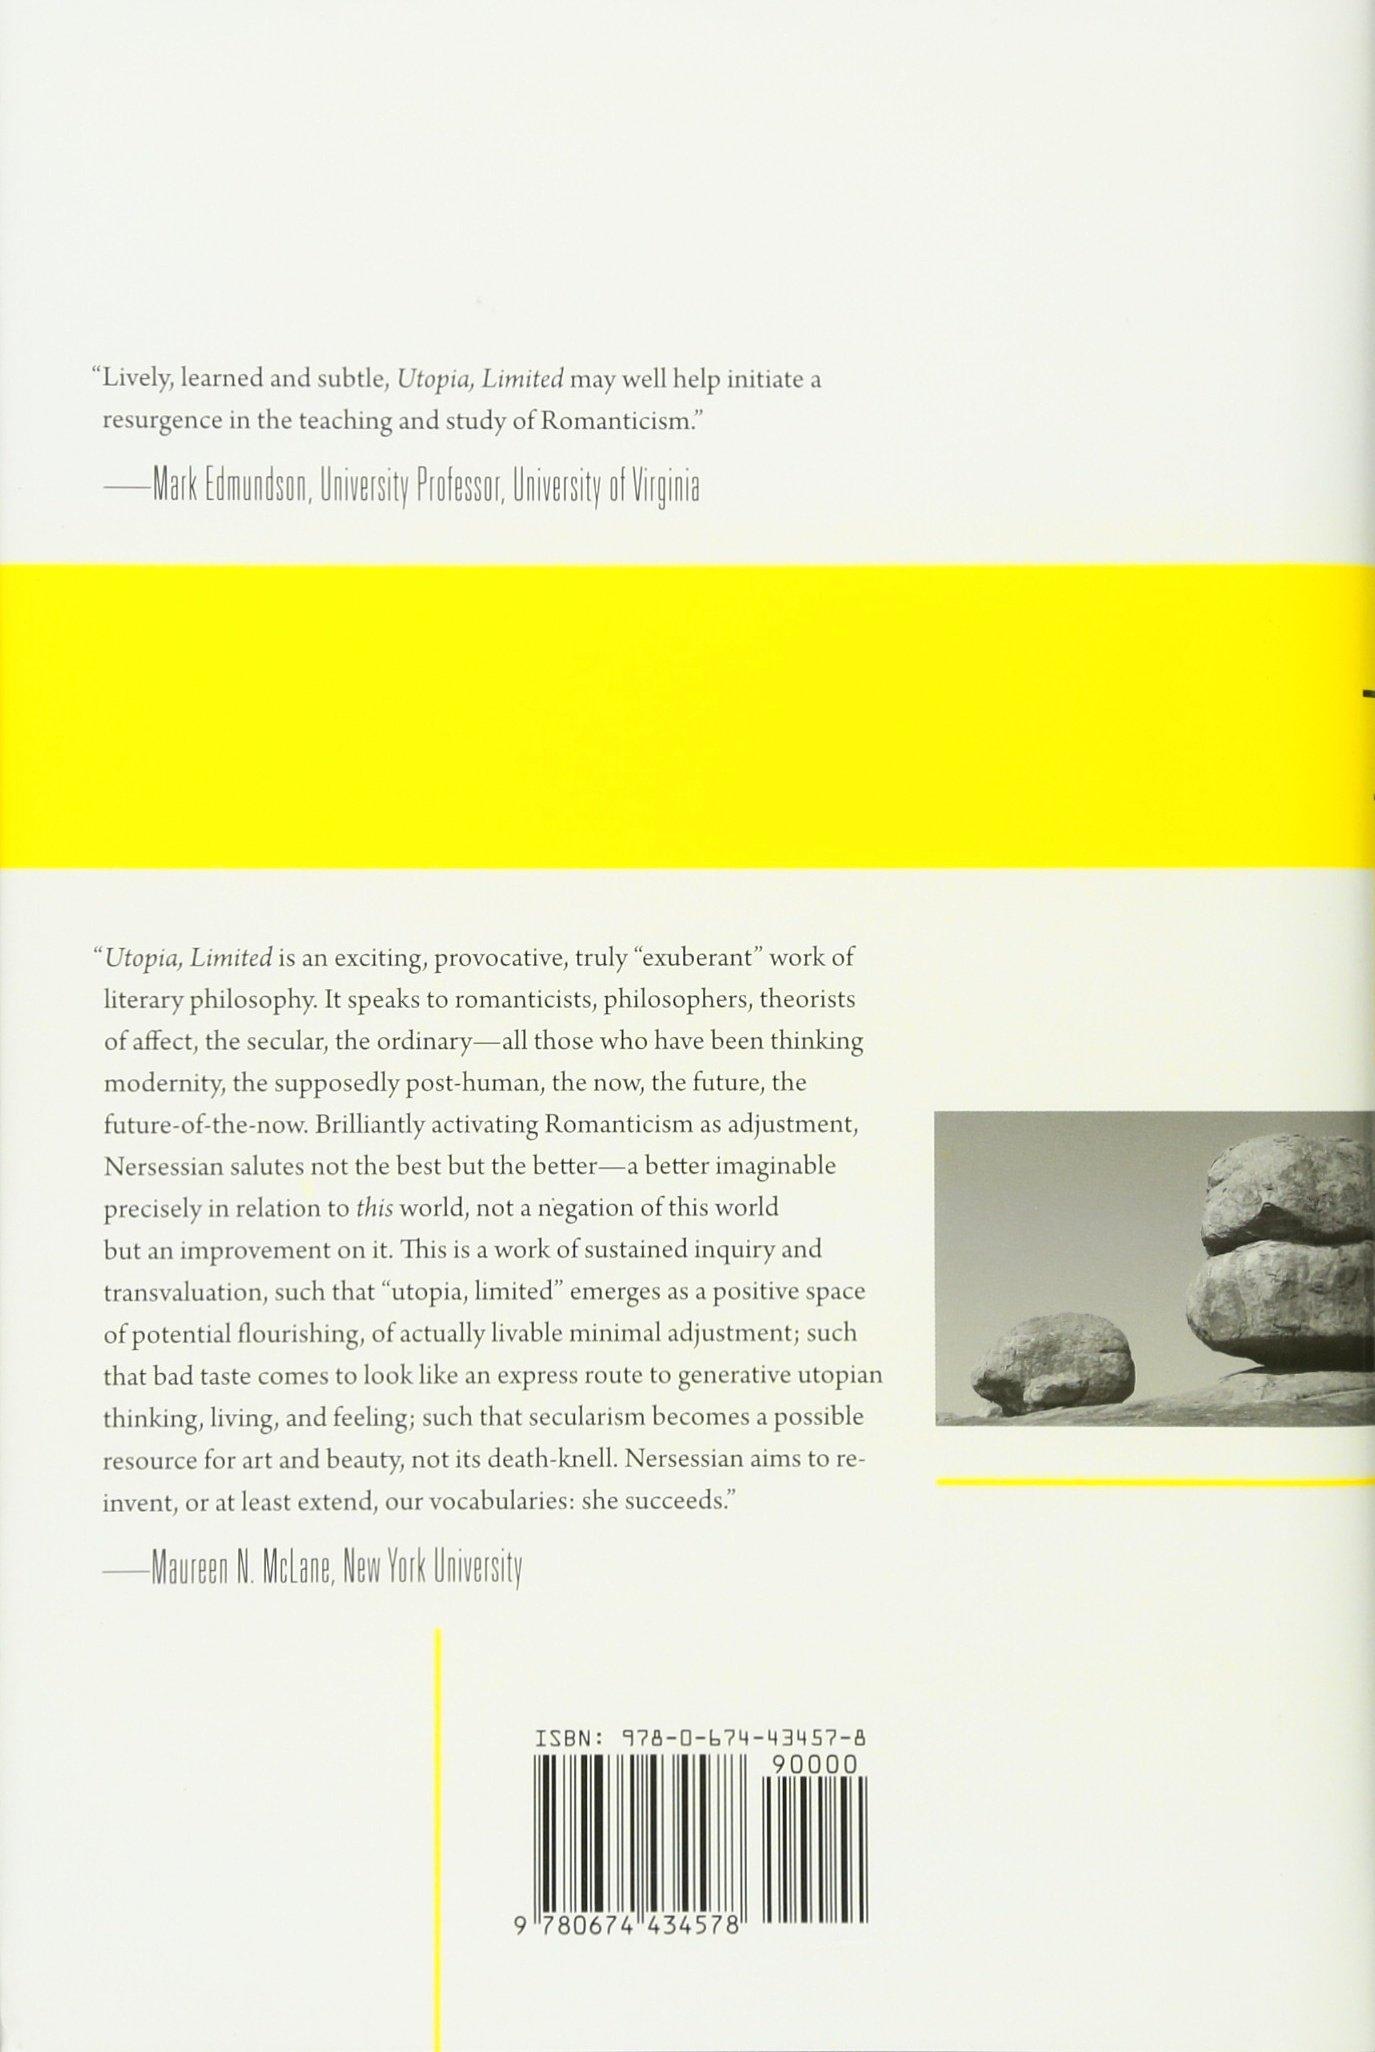 Amazon.com: Utopia, Limited: Romanticism and Adjustment (9780674434578):  Anahid Nersessian: Books